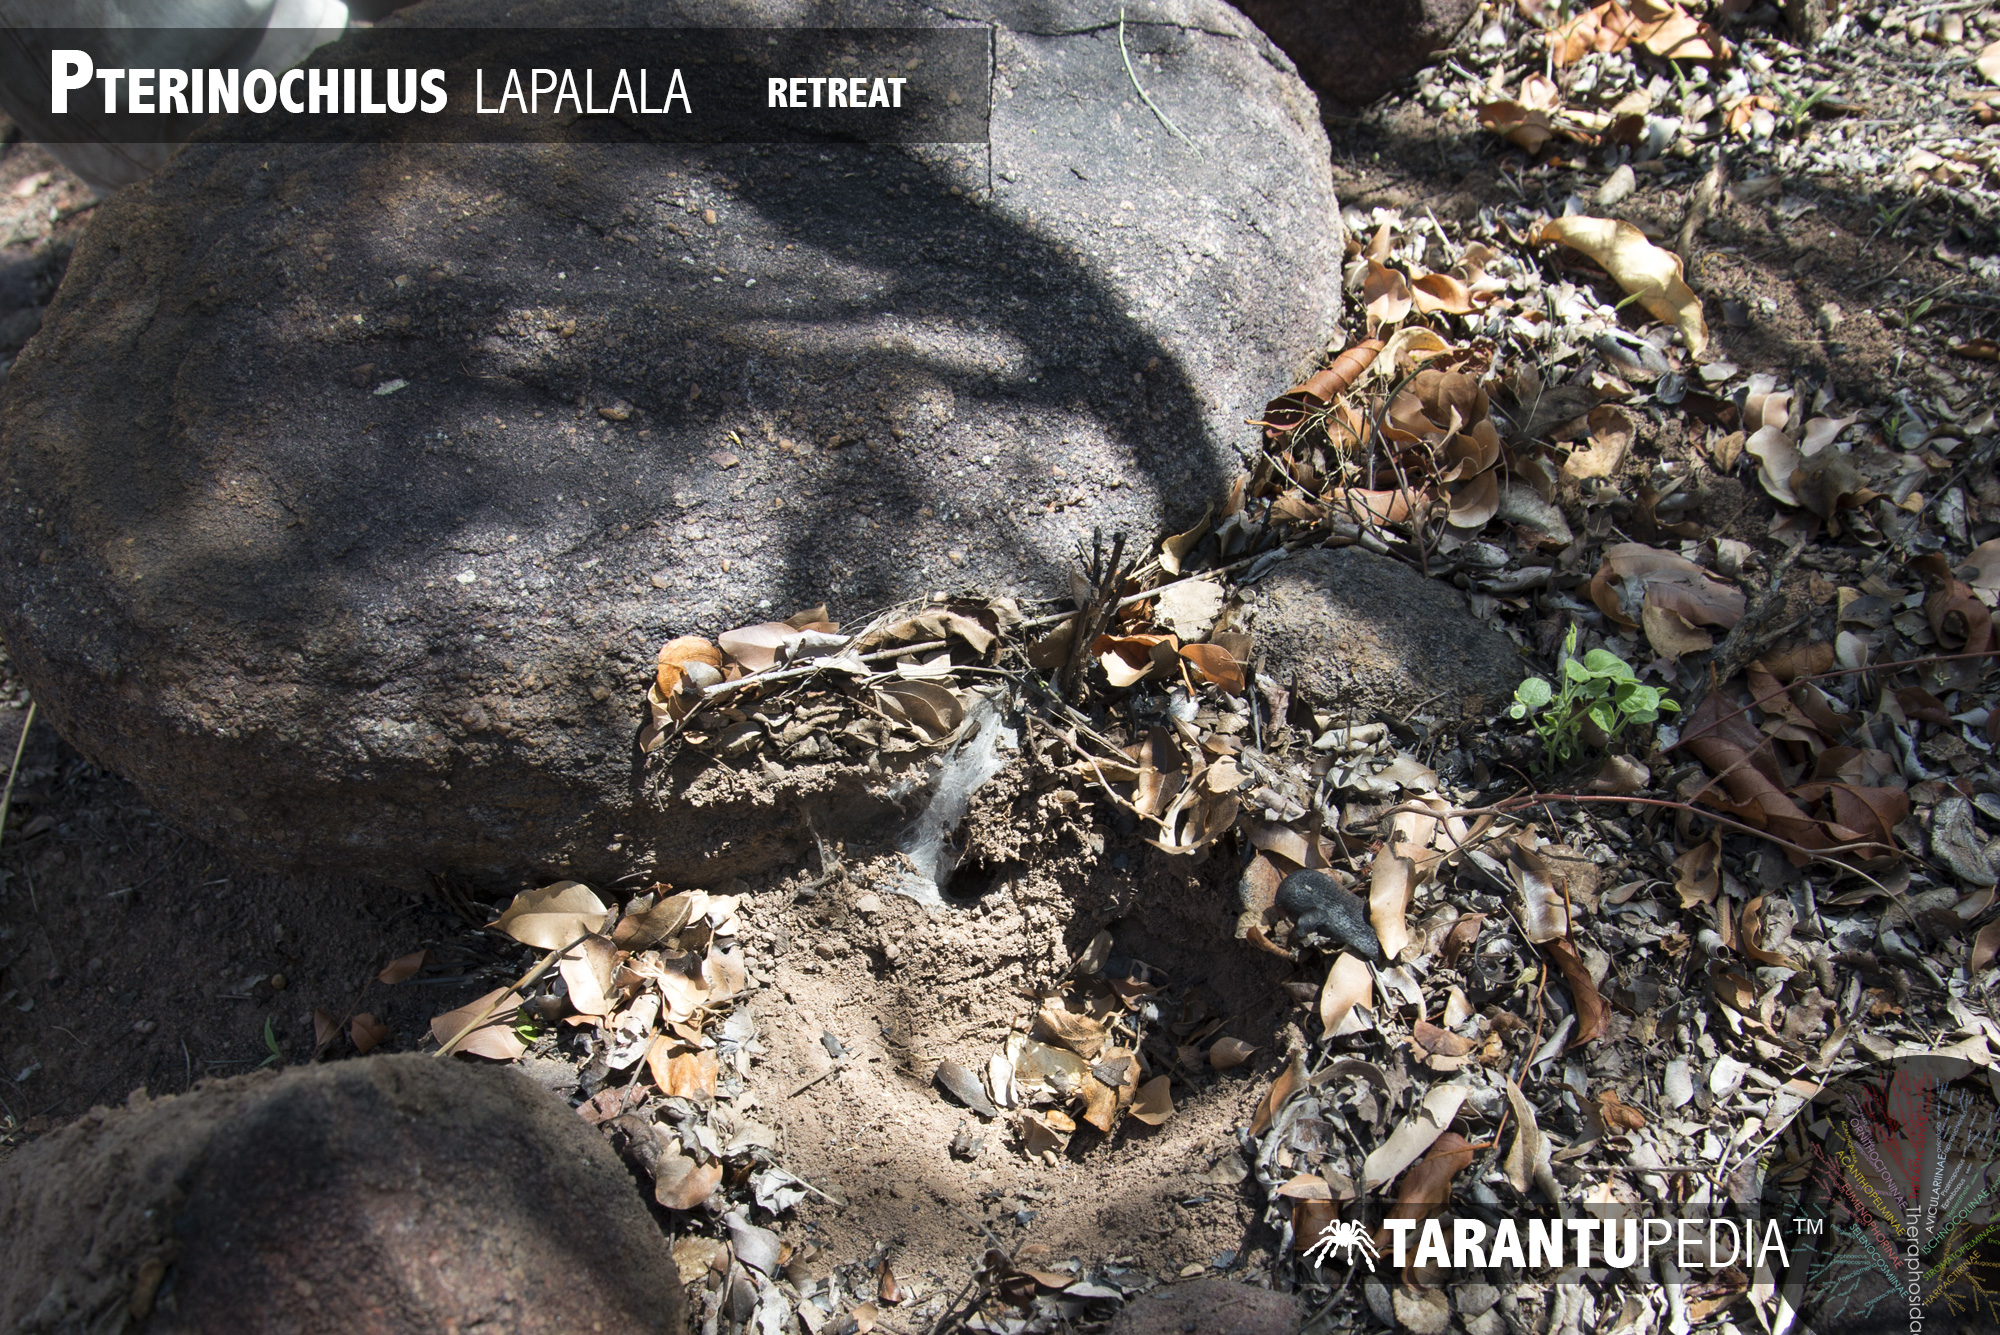 Pterinochilus lapalala